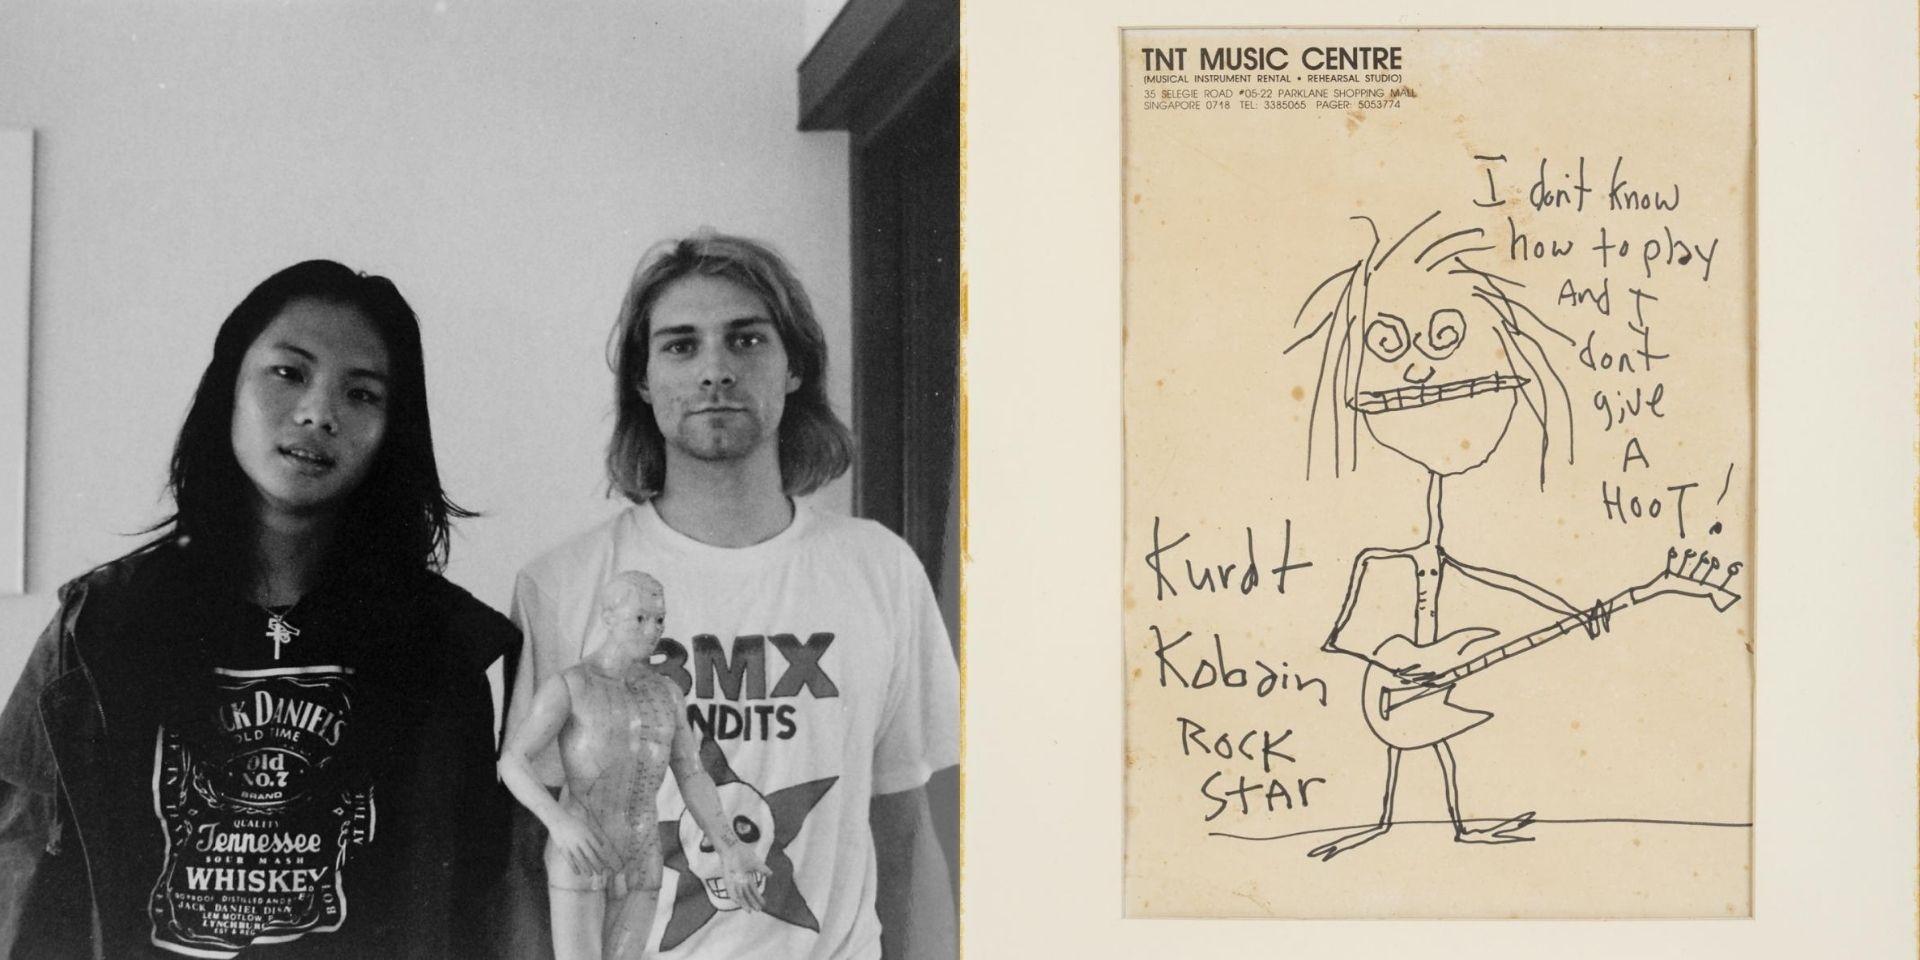 1992 self-portrait of Kurt Cobain in Singapore sells for US$281,250